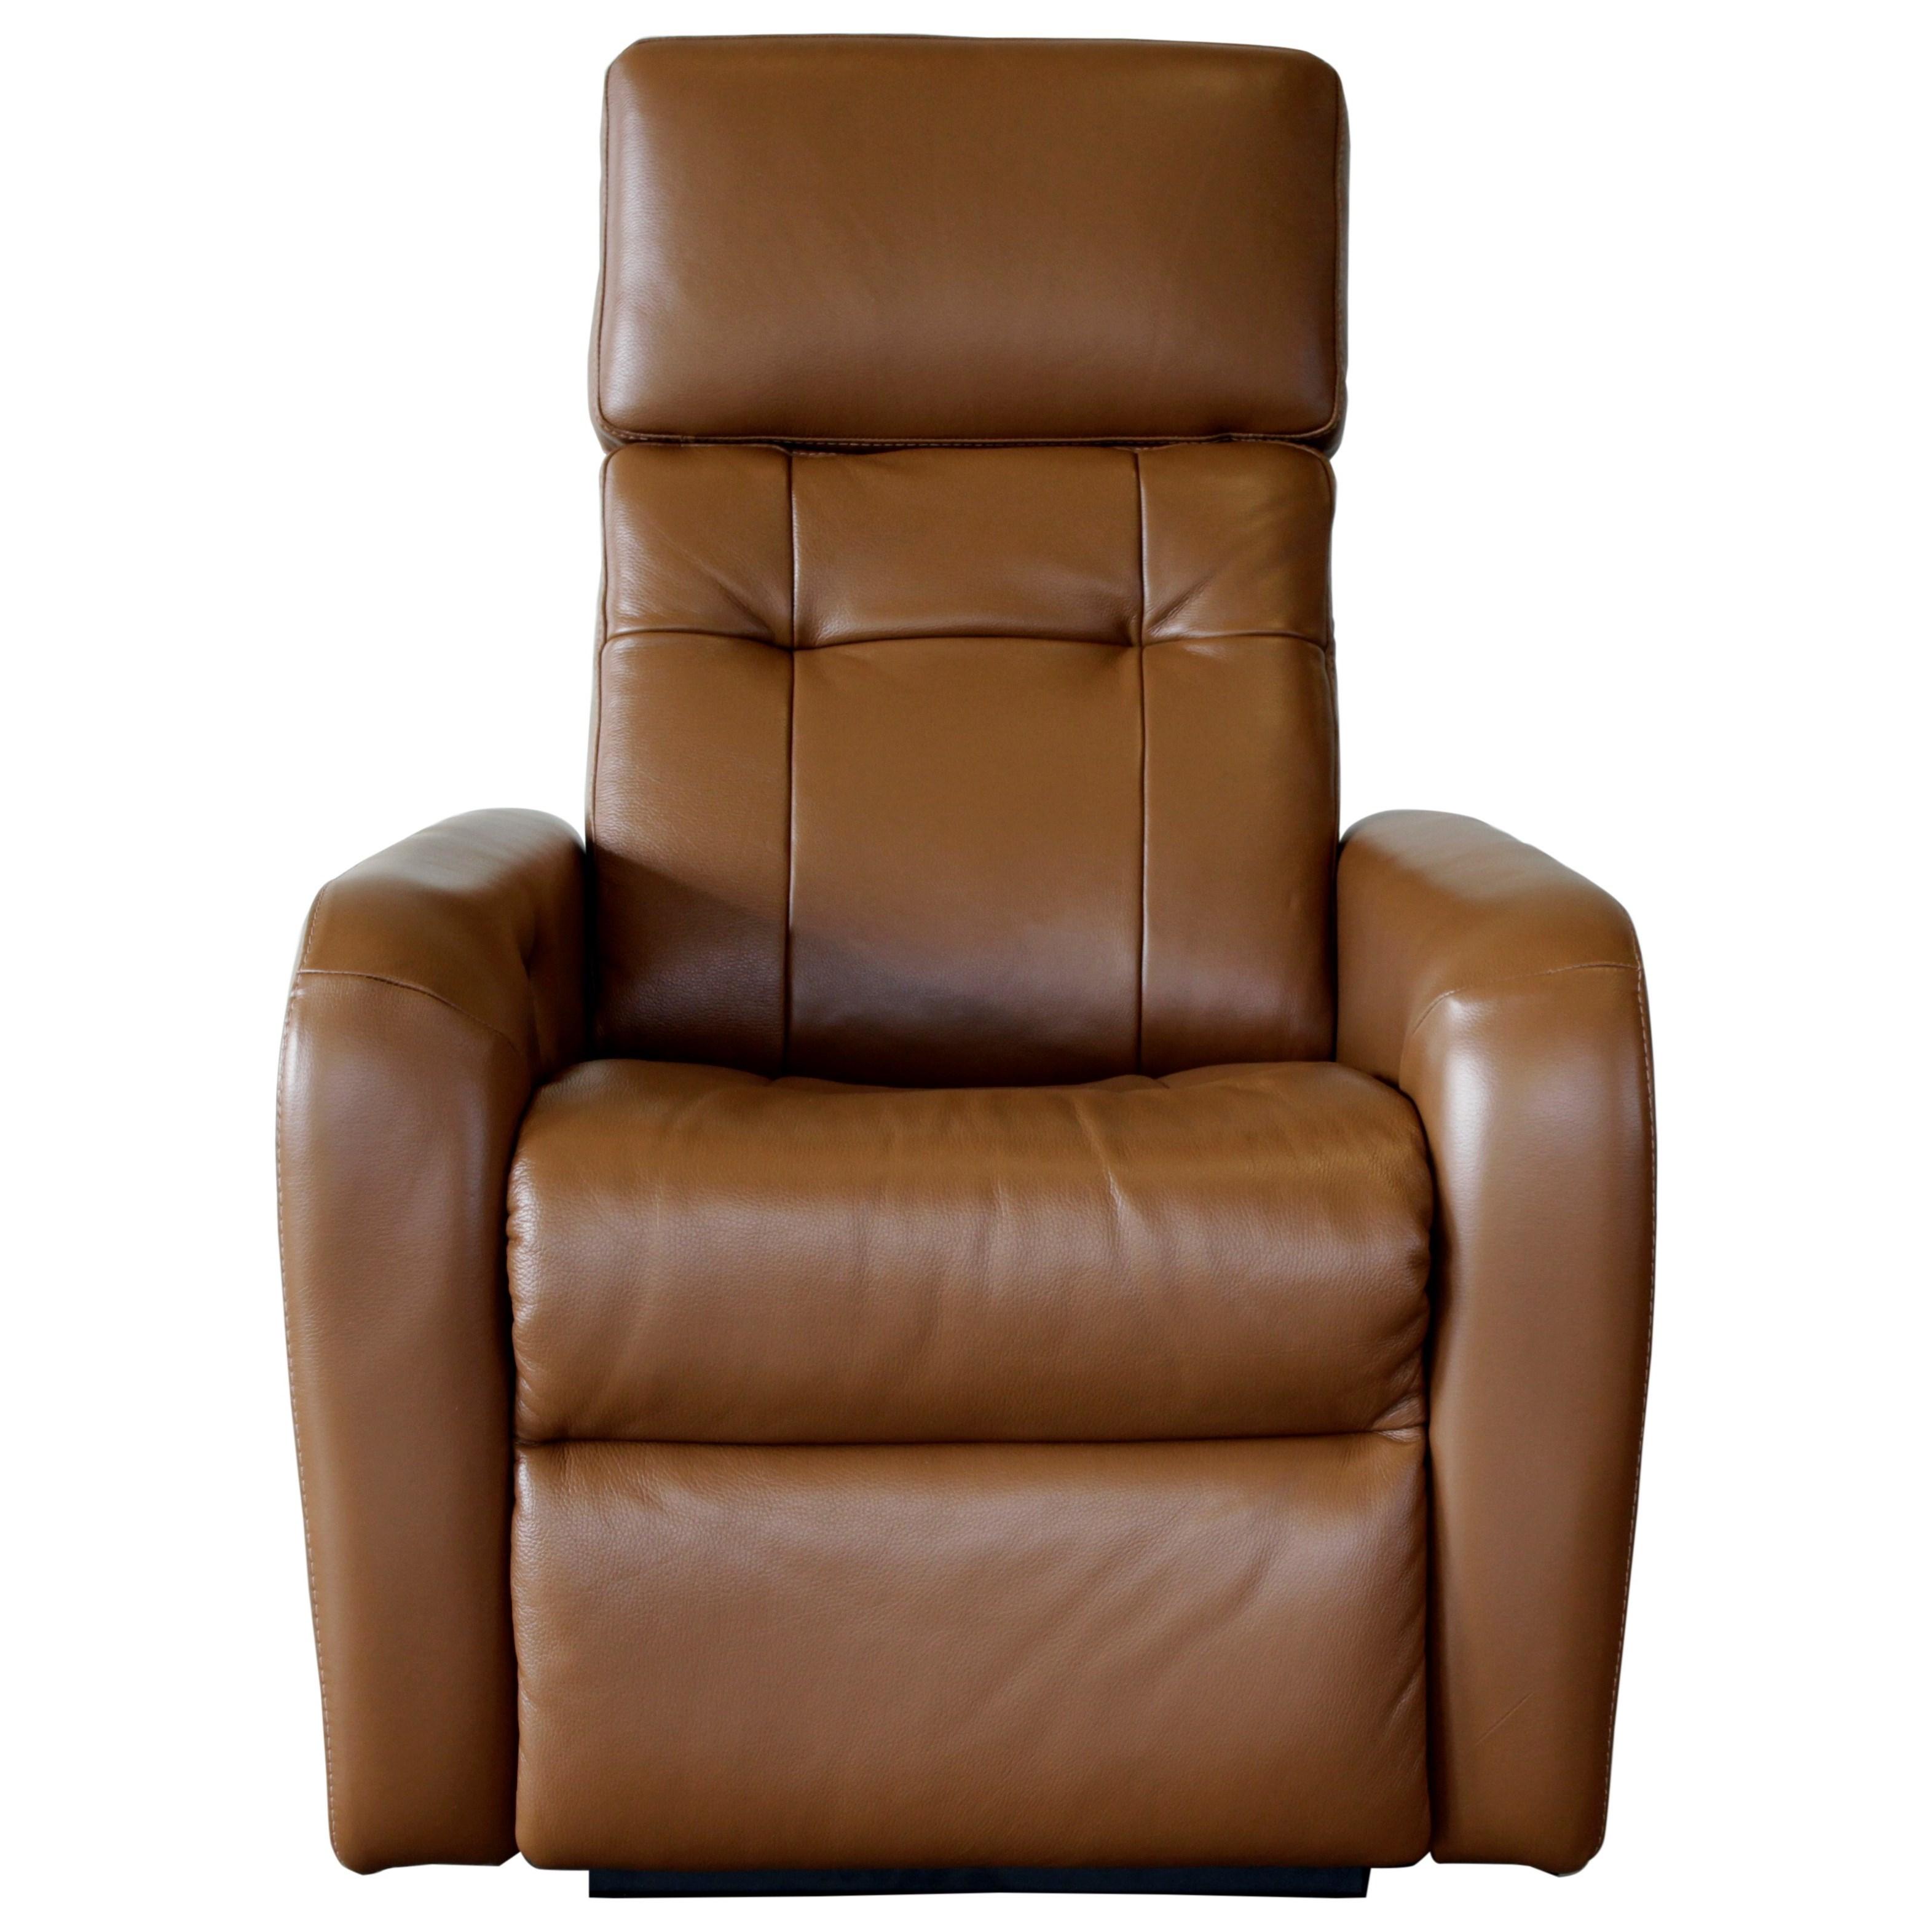 Sorrento Power Recliner by Palliser at HomeWorld Furniture